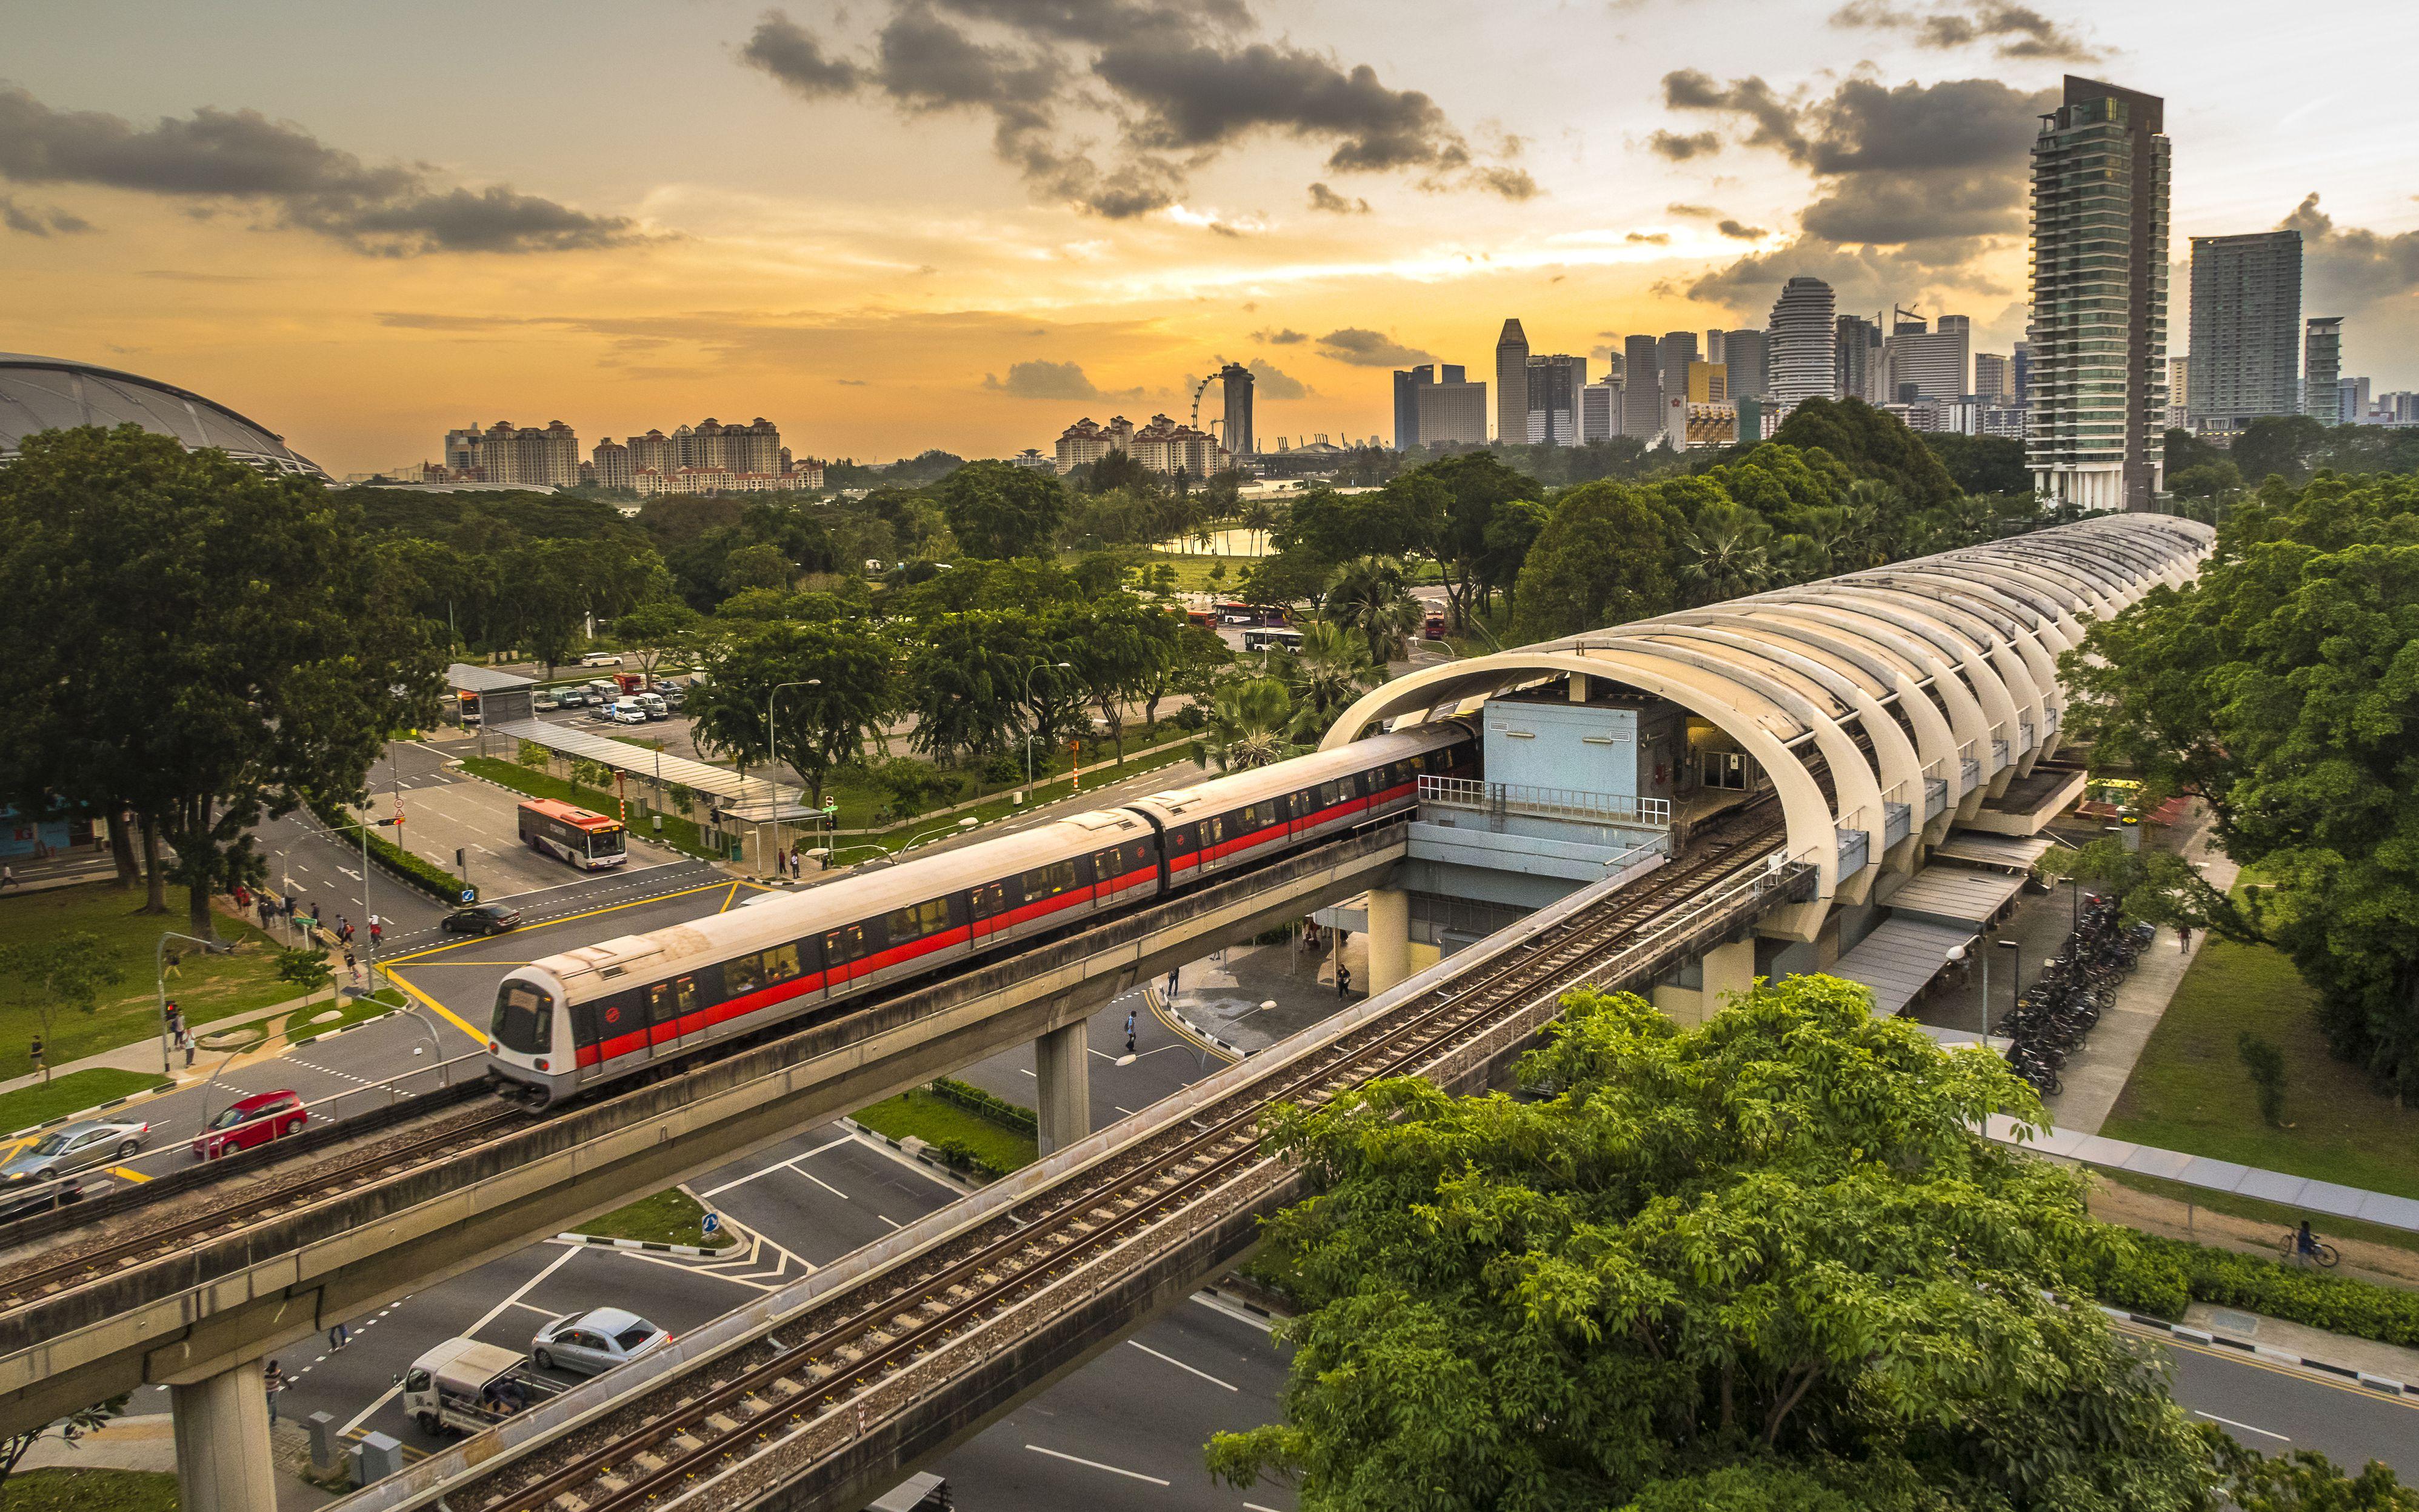 Singapore Mass Rapid Transit (MRT) - Kallang station